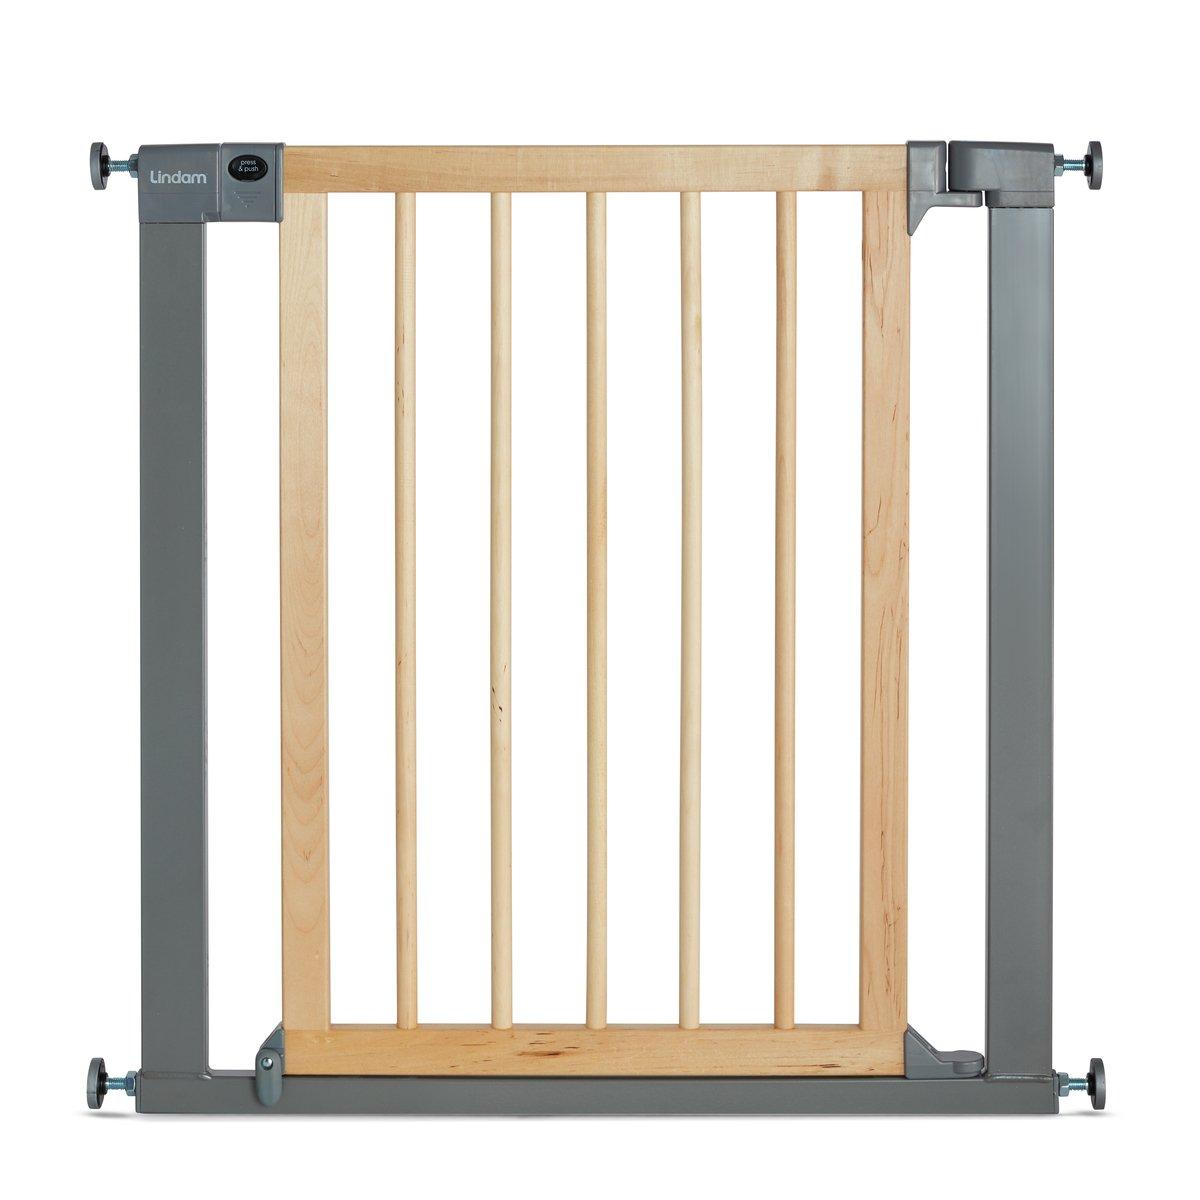 Lindam Barrière - Sure Shut Déco - Natural Wood and Silver Metal 04443101